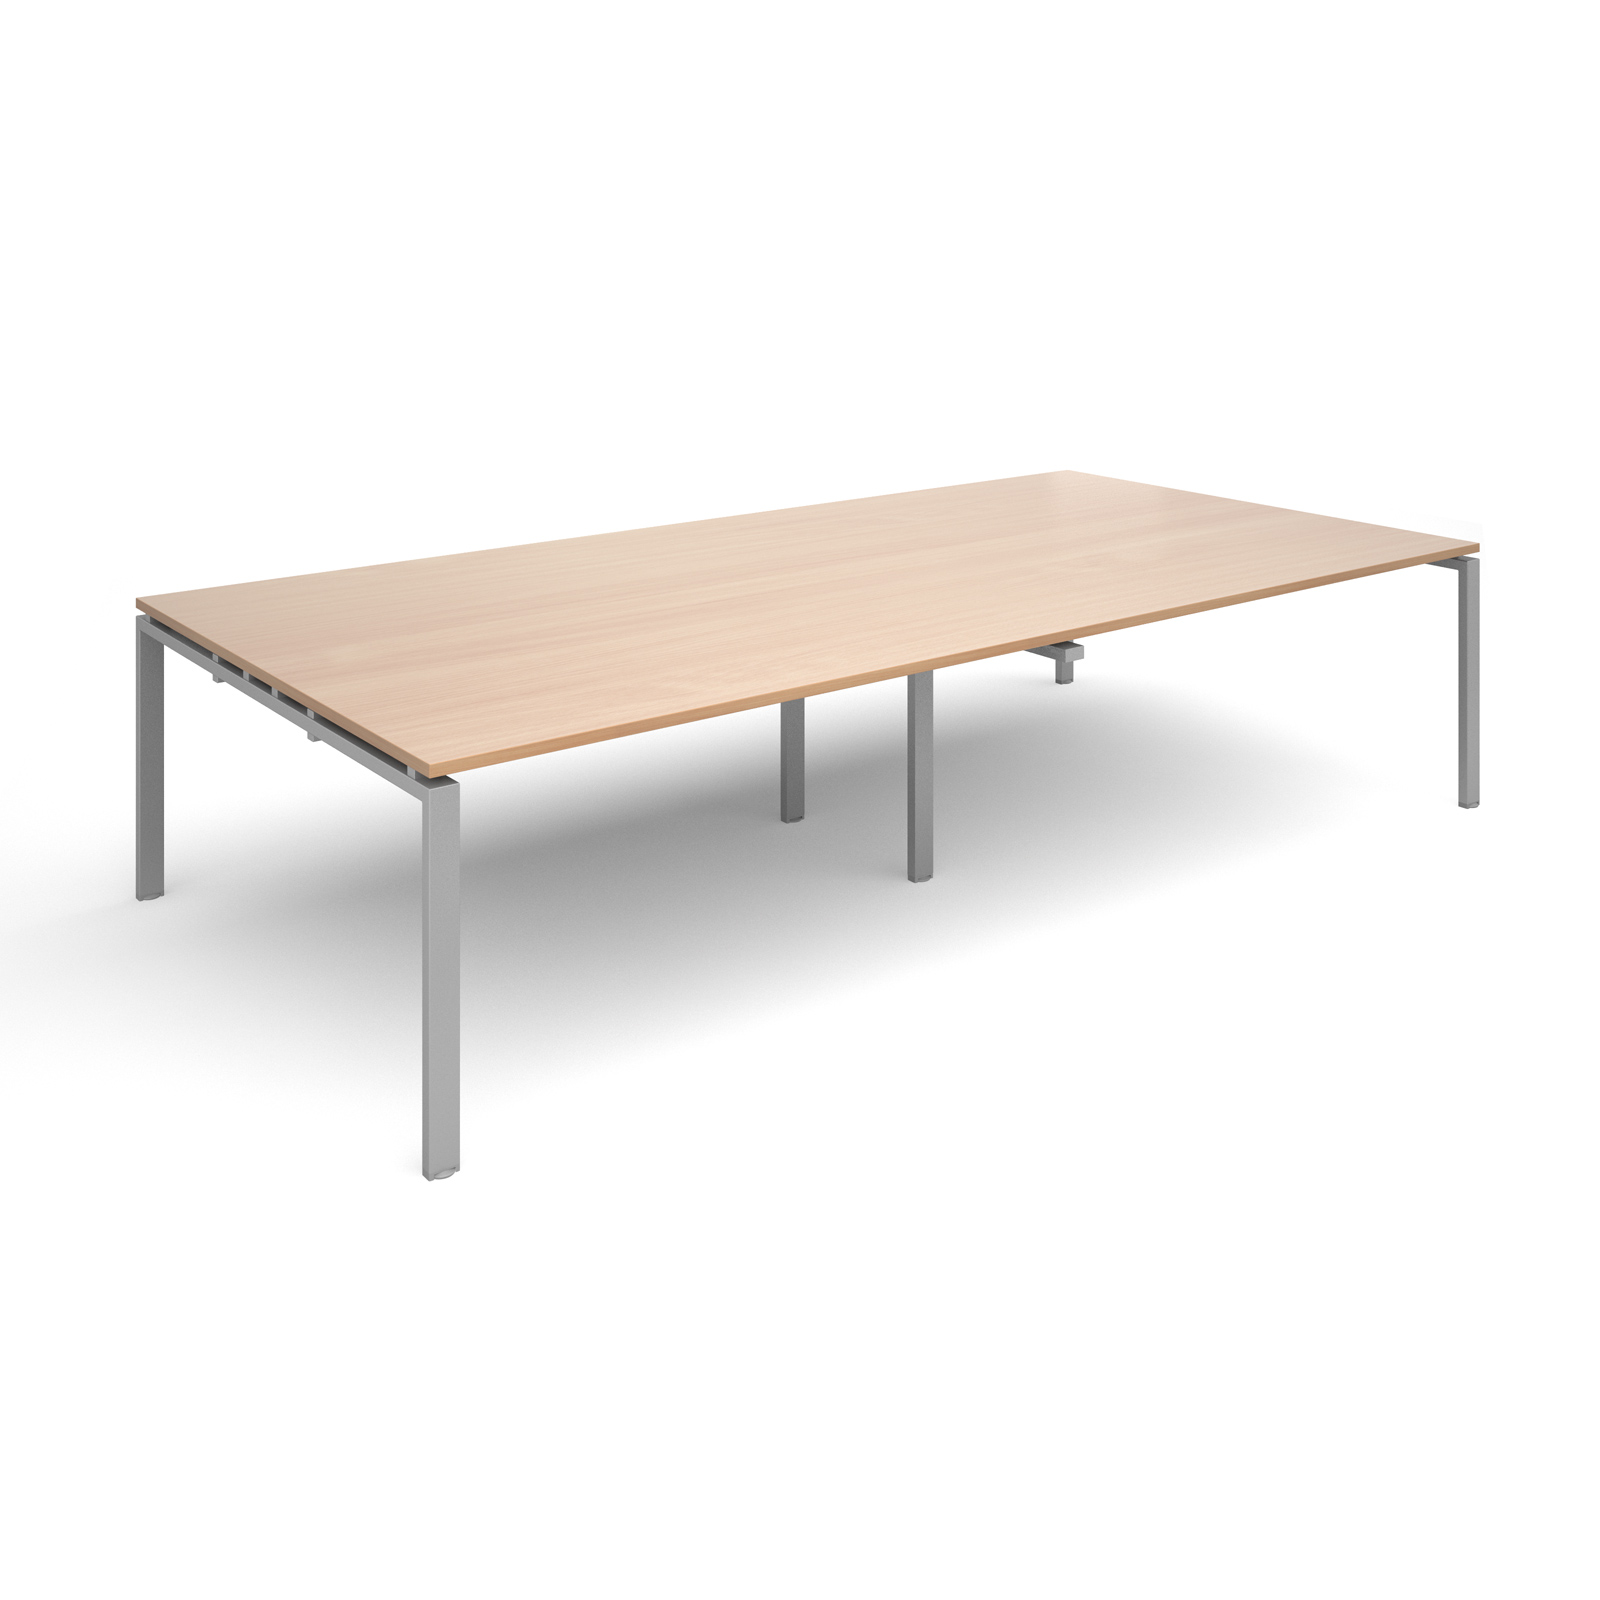 Adapt rectangular boardroom table